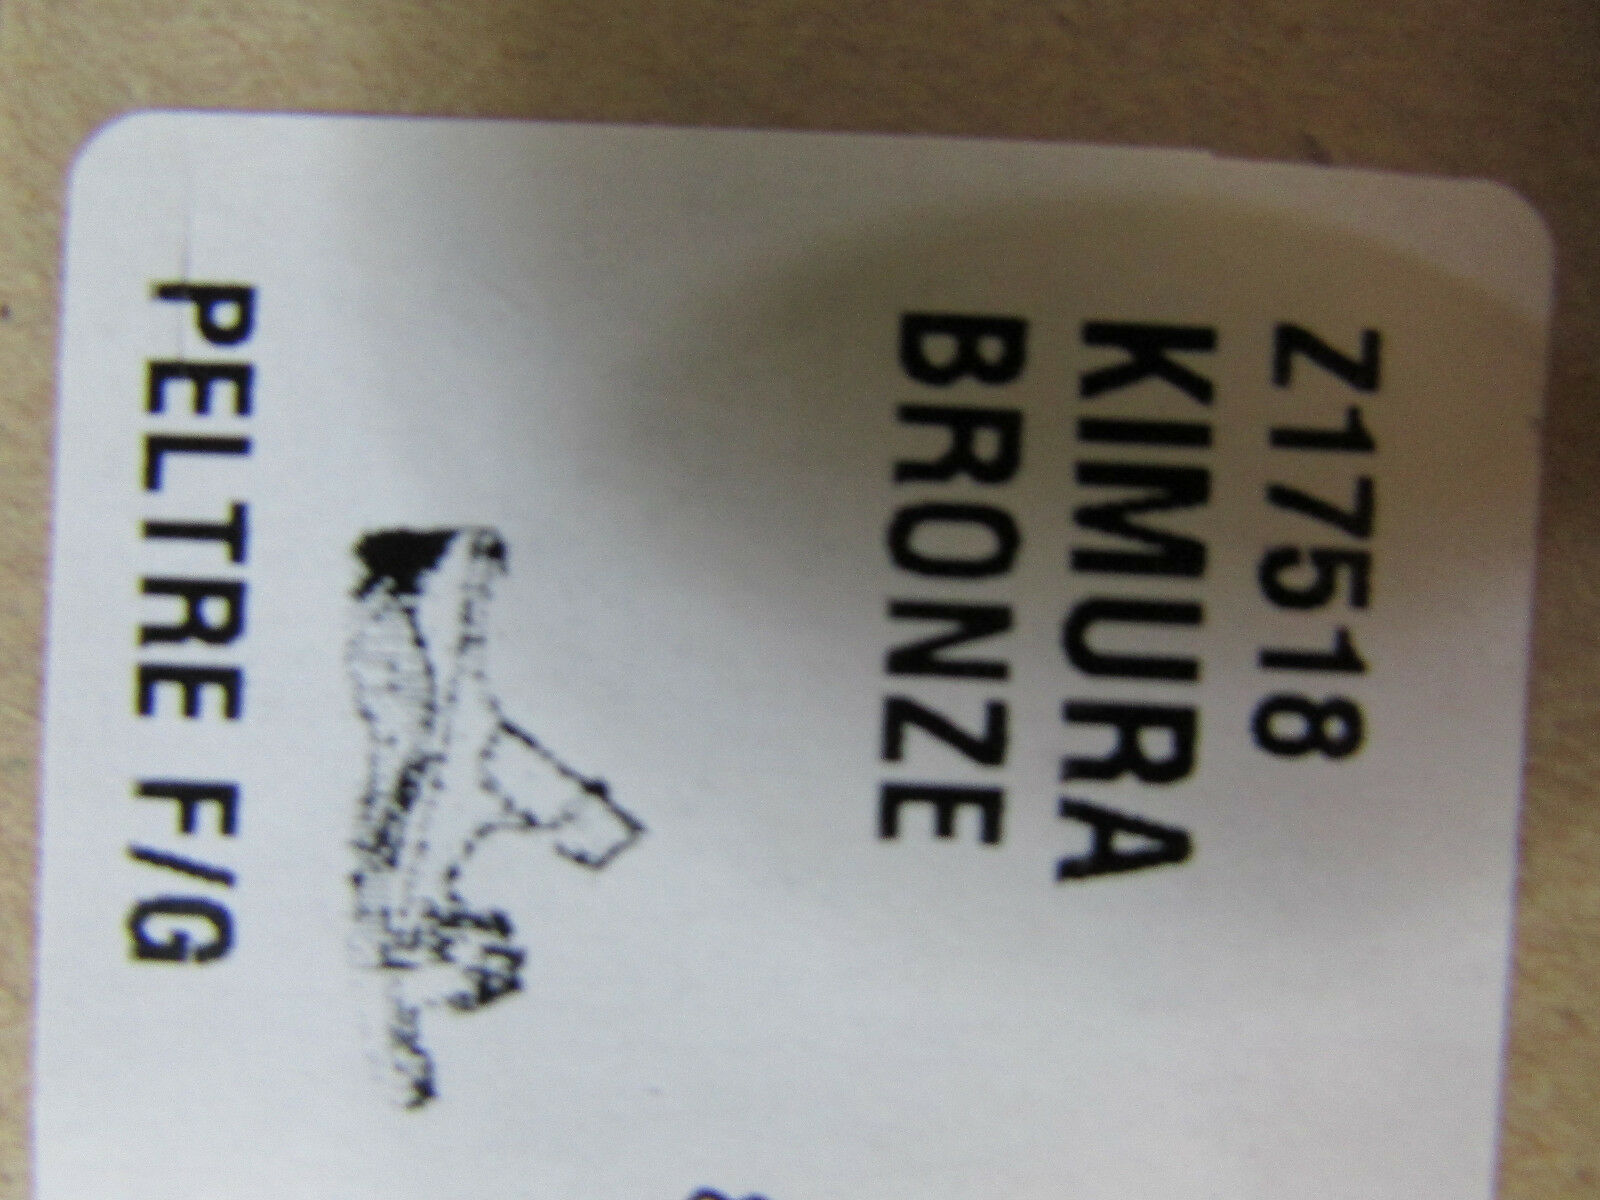 NEW B.O.C KIMURA BRONZE SANDALS Damenschuhe 8 SHIP SLIDES COMFORT SOLES FREE SHIP 8 6c8708